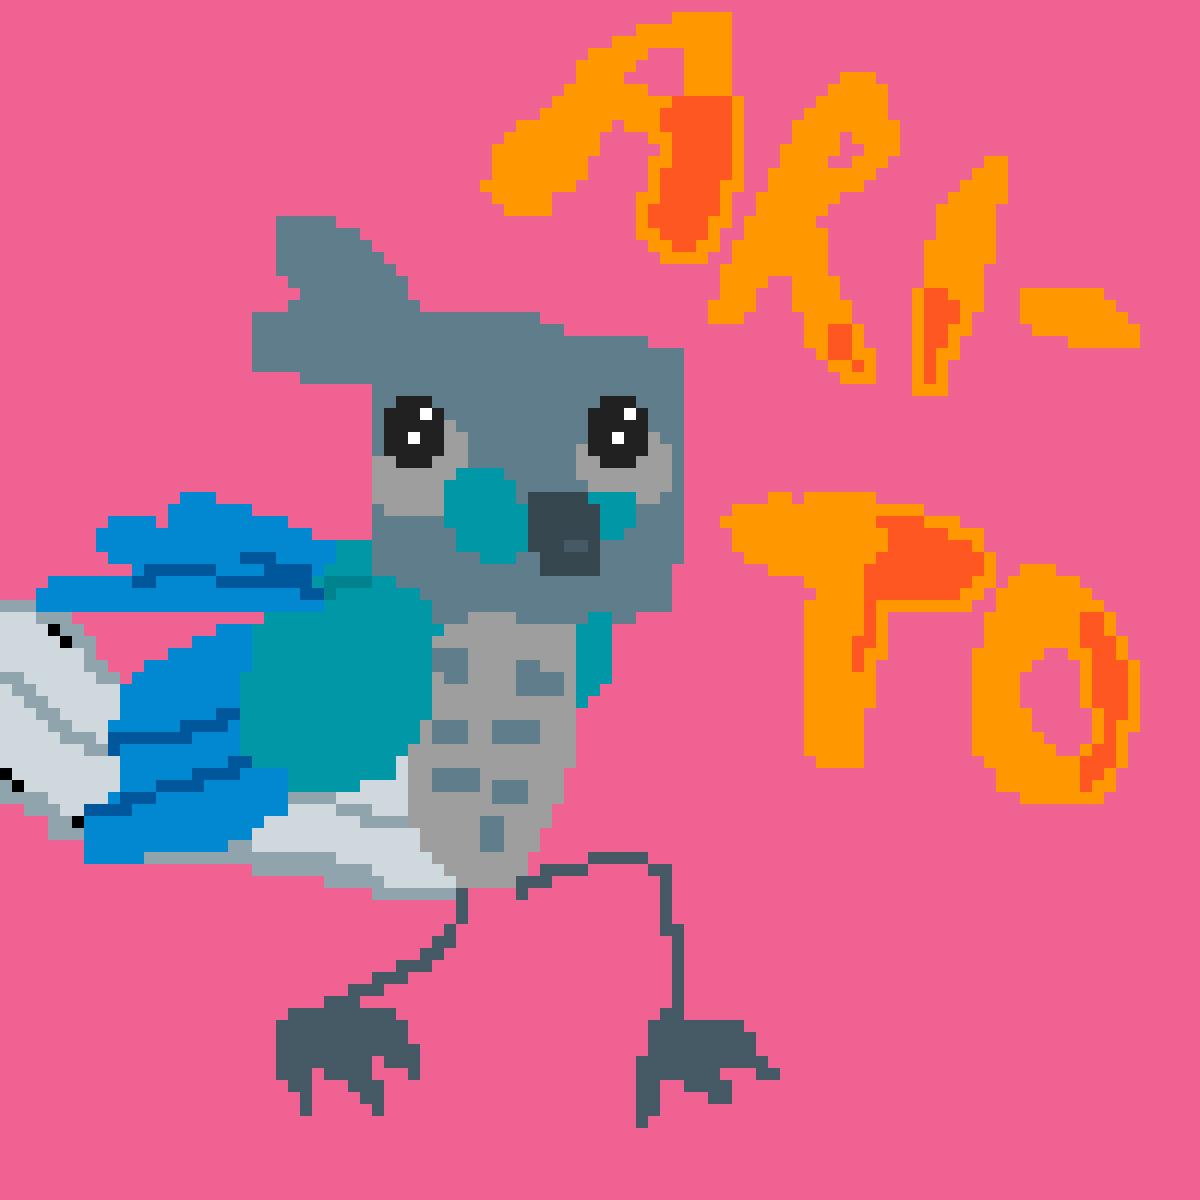 Ari-To by CookieBrooky